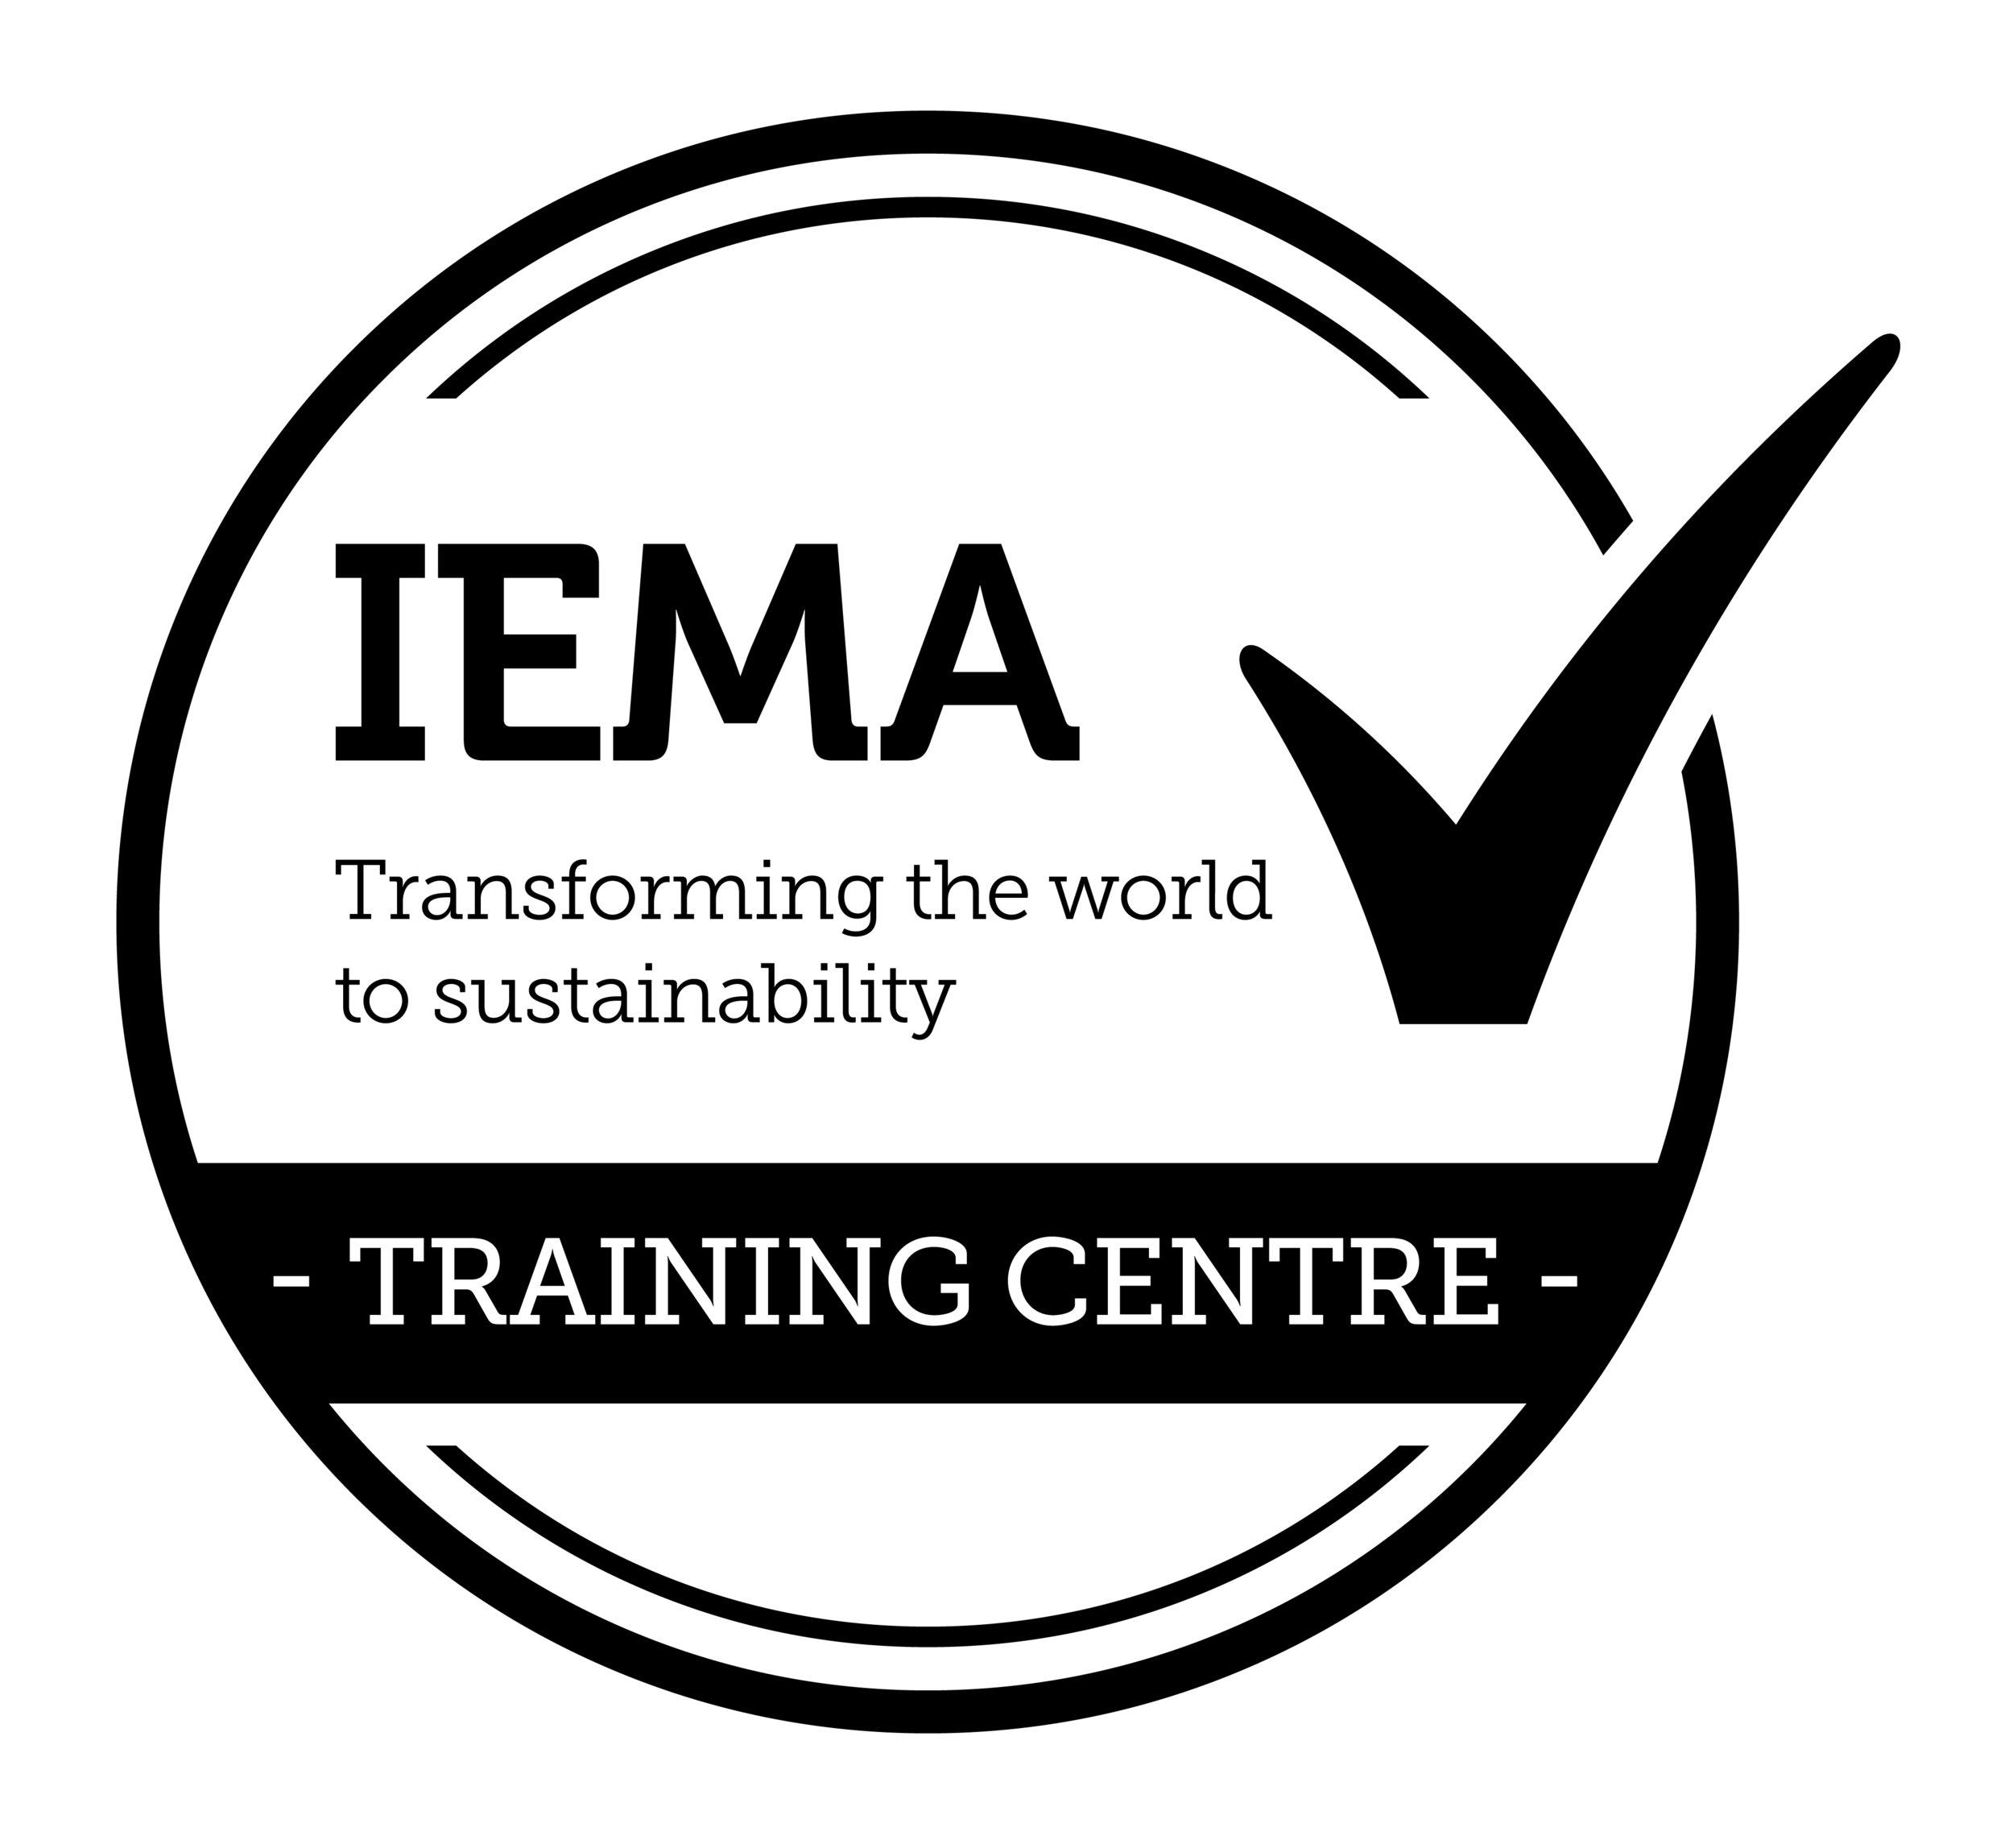 IEMALOGO_Training Centre.jpg